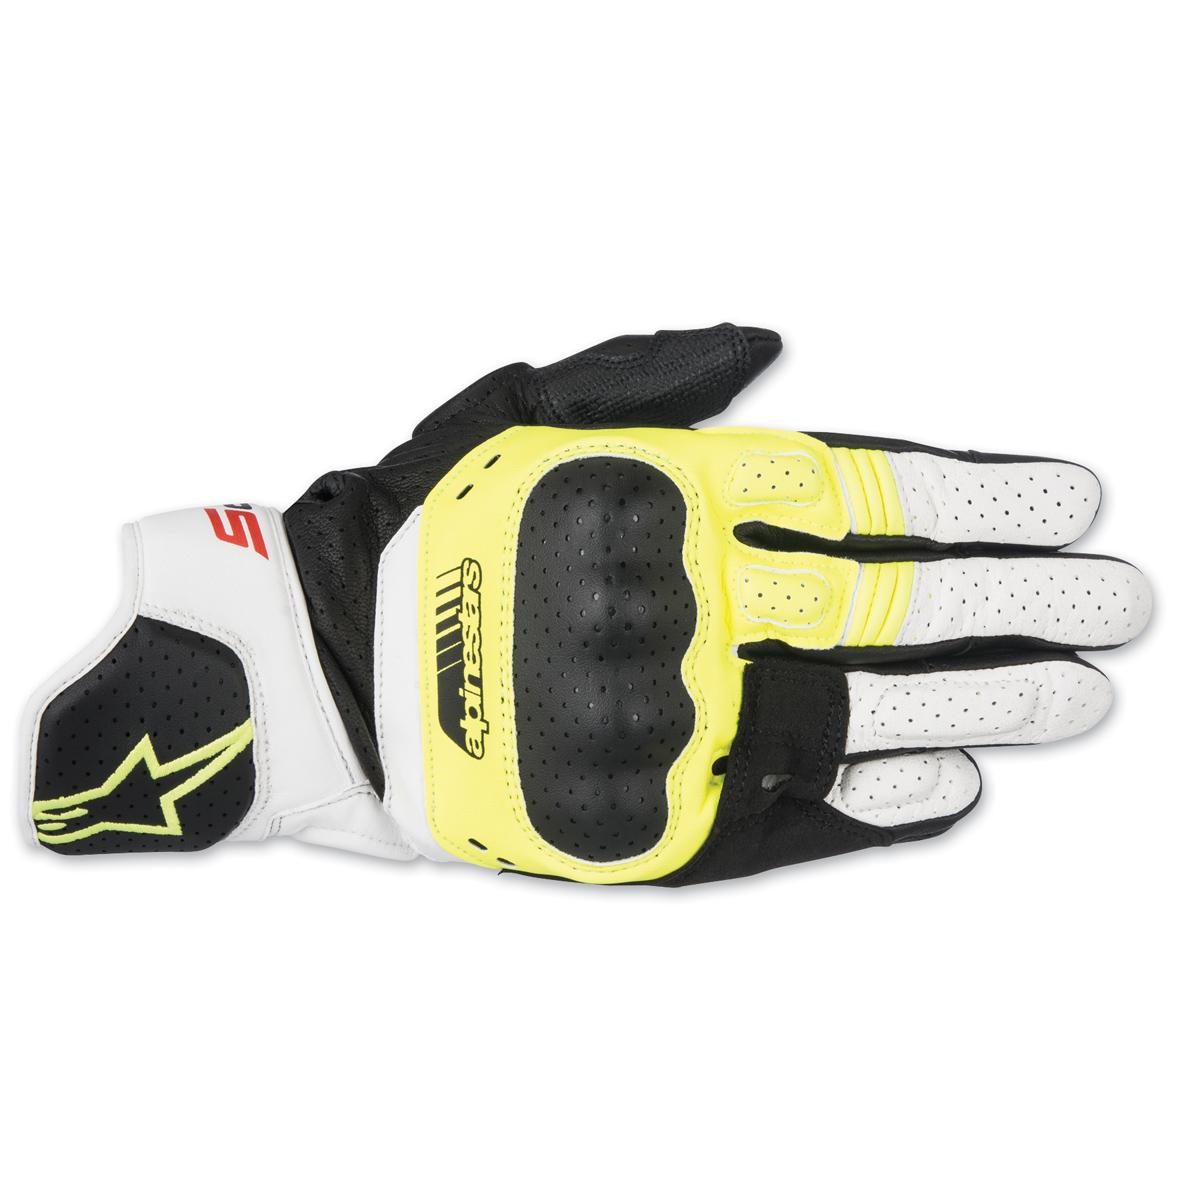 2b22bd43fde31 Alpinestars Men's SP-5 Black/Yellow/White Leather Gloves - 3558517 ...